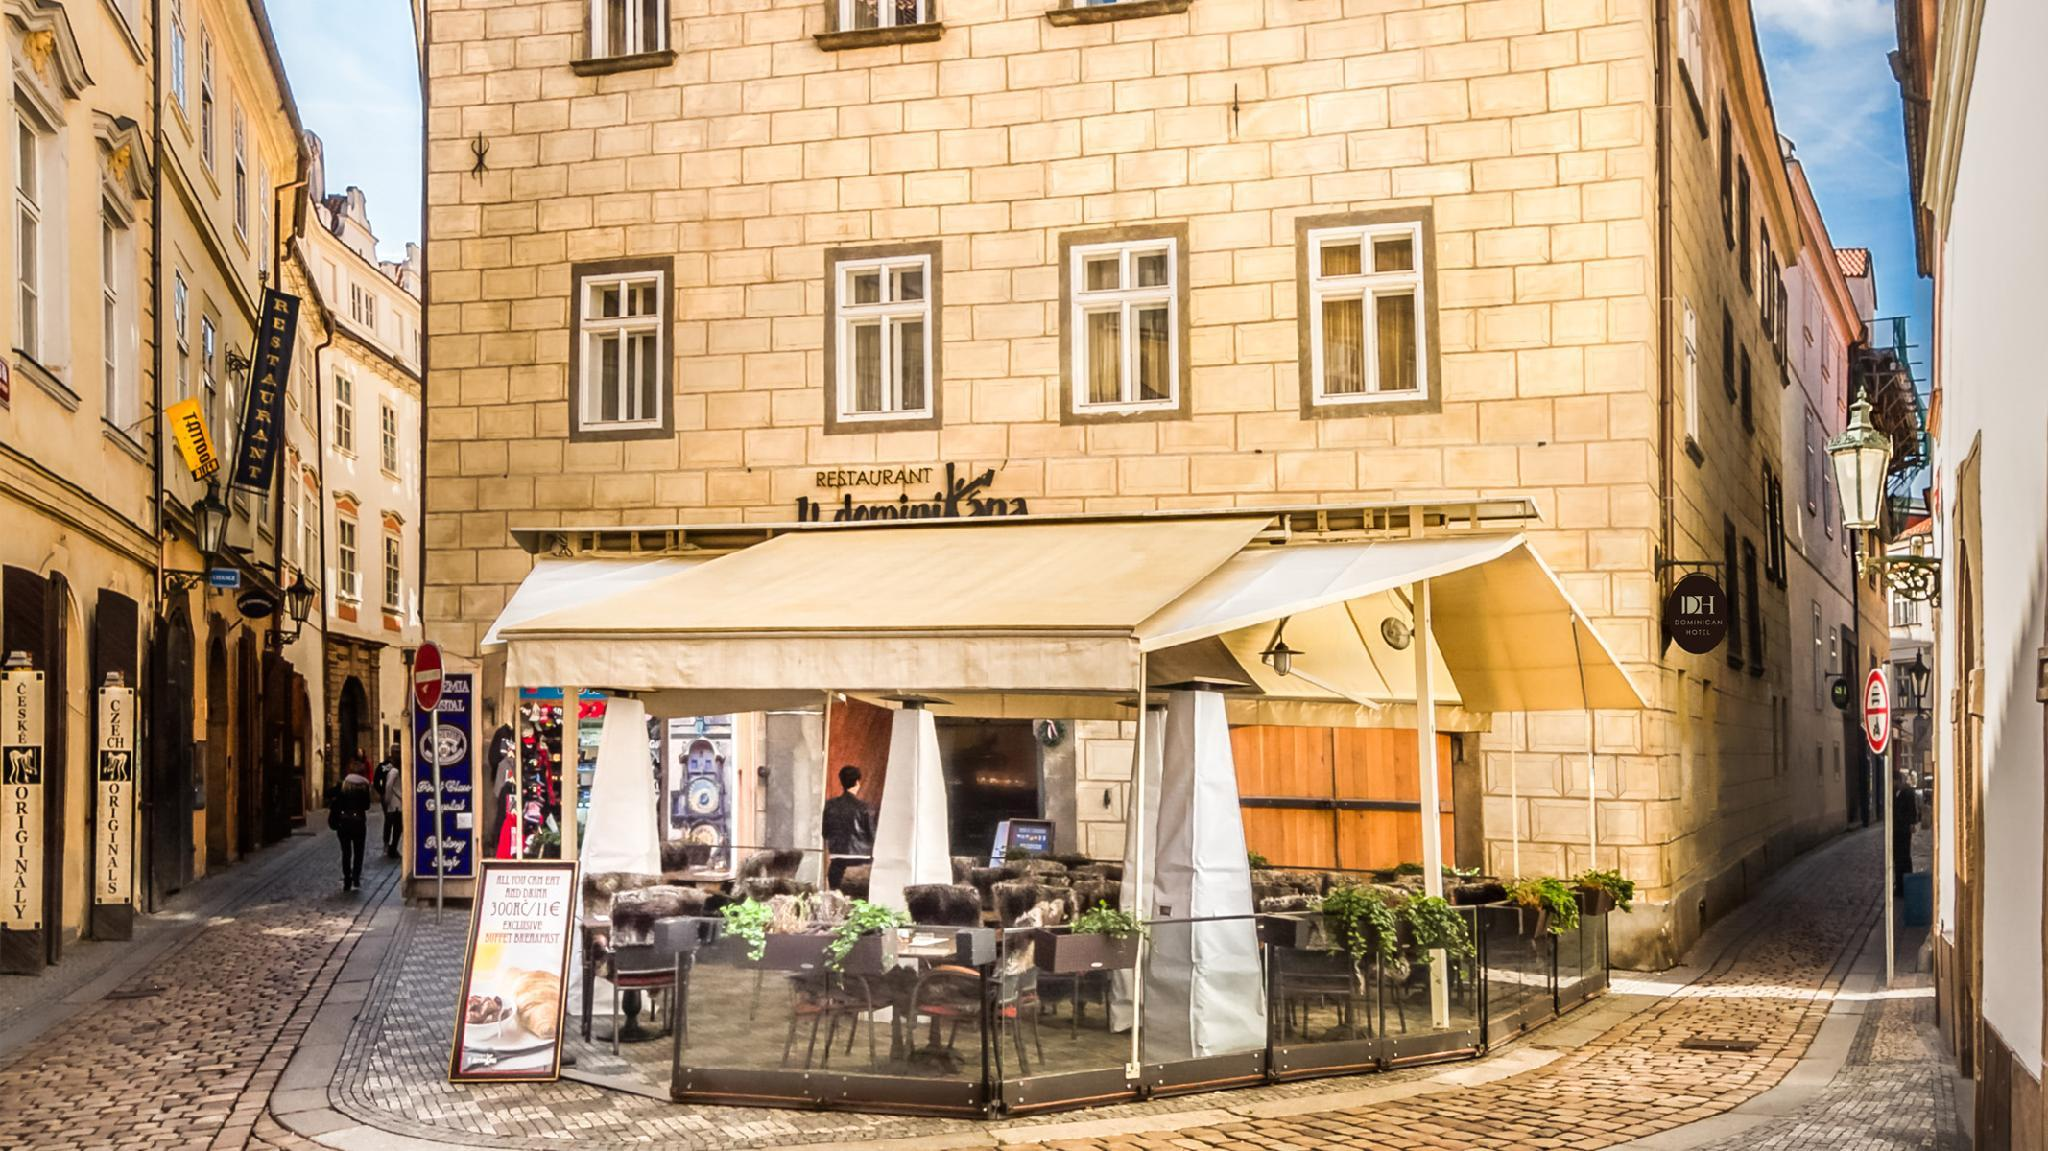 Praga češka republika